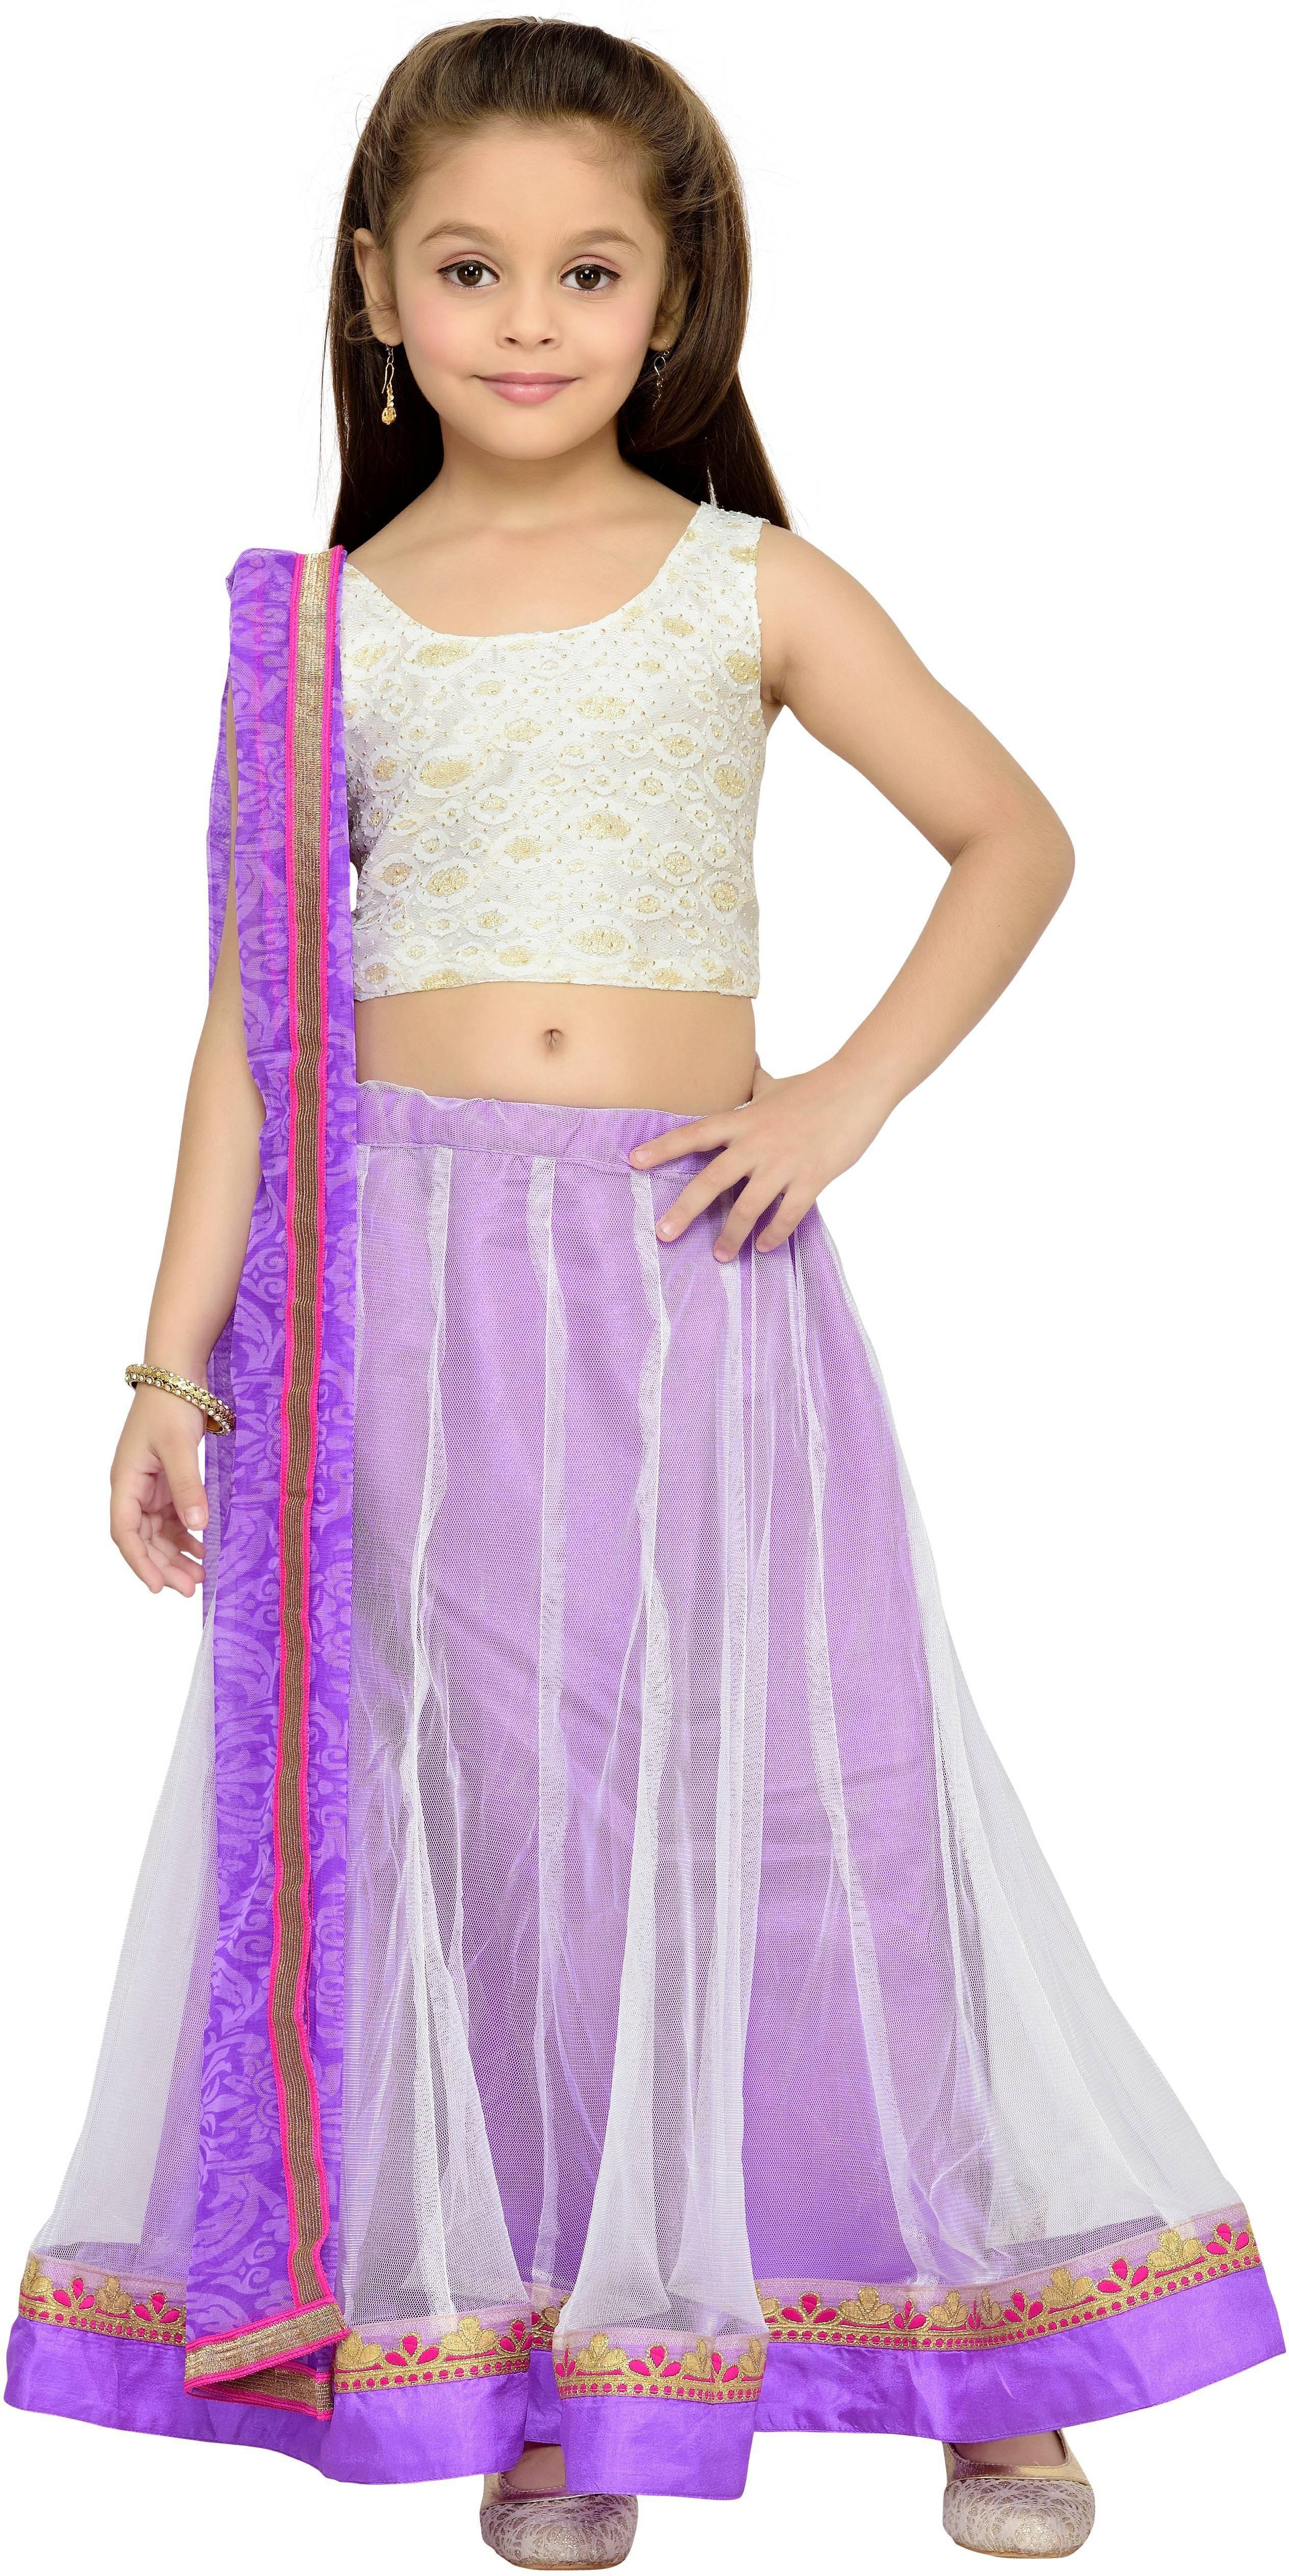 Kay Girls Lehenga Choli Fusion Wear, Ethnic Wear Self Design Lehenga, Choli and Dupatta Set(White, Pack of 1)